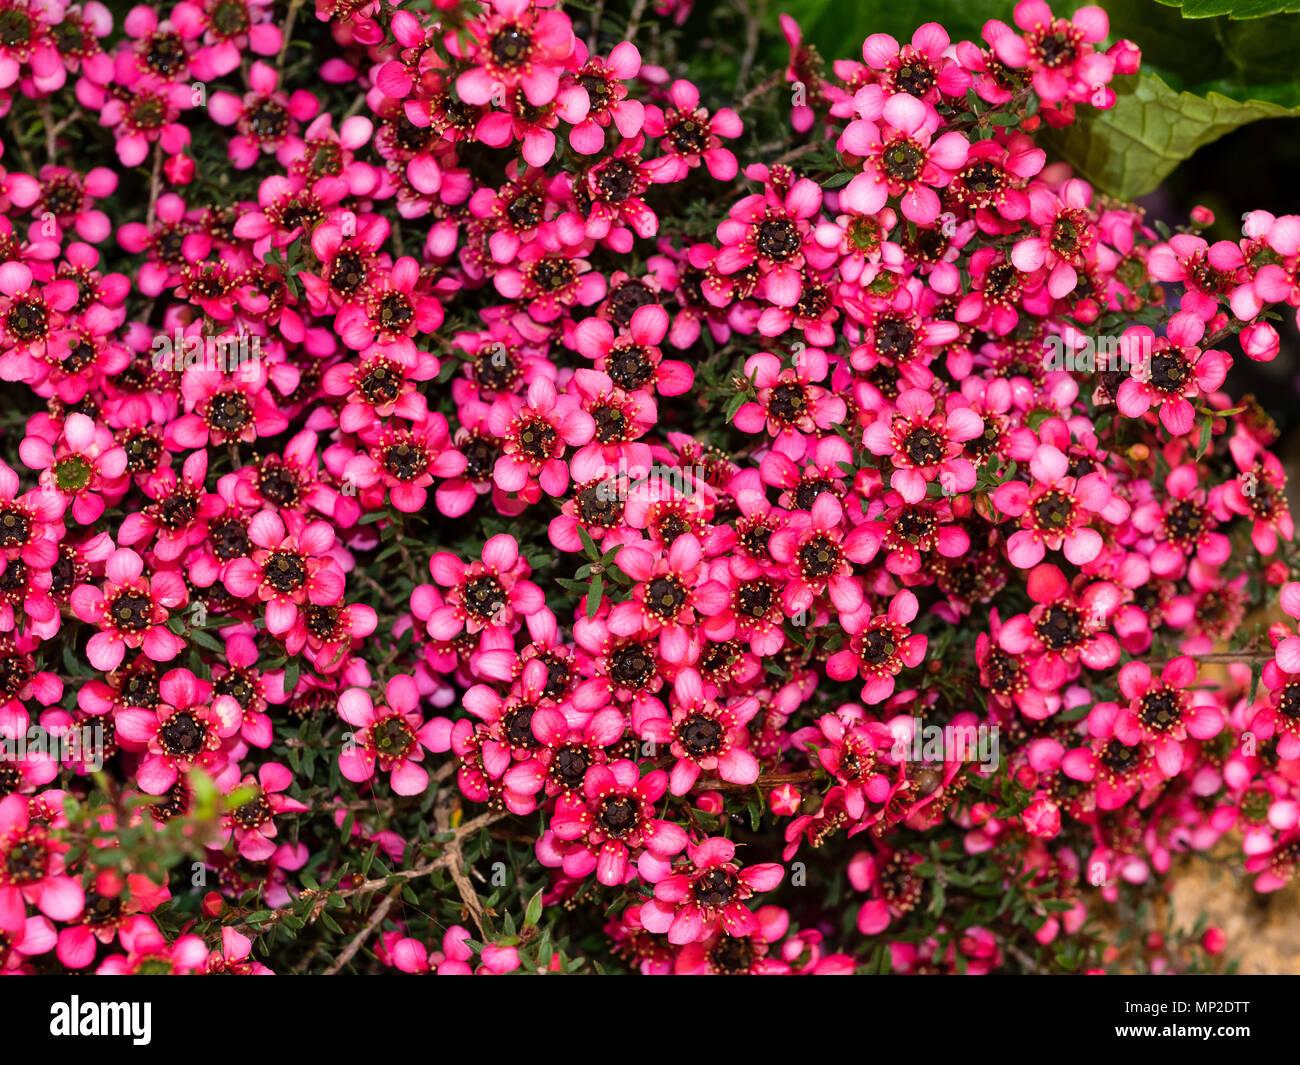 Rot blühenden Form der Neuseeland Manuka oder Teebaum, Leptospermum scoparium' Kiwi, Hardy in milderen Klimazonen Stockbild